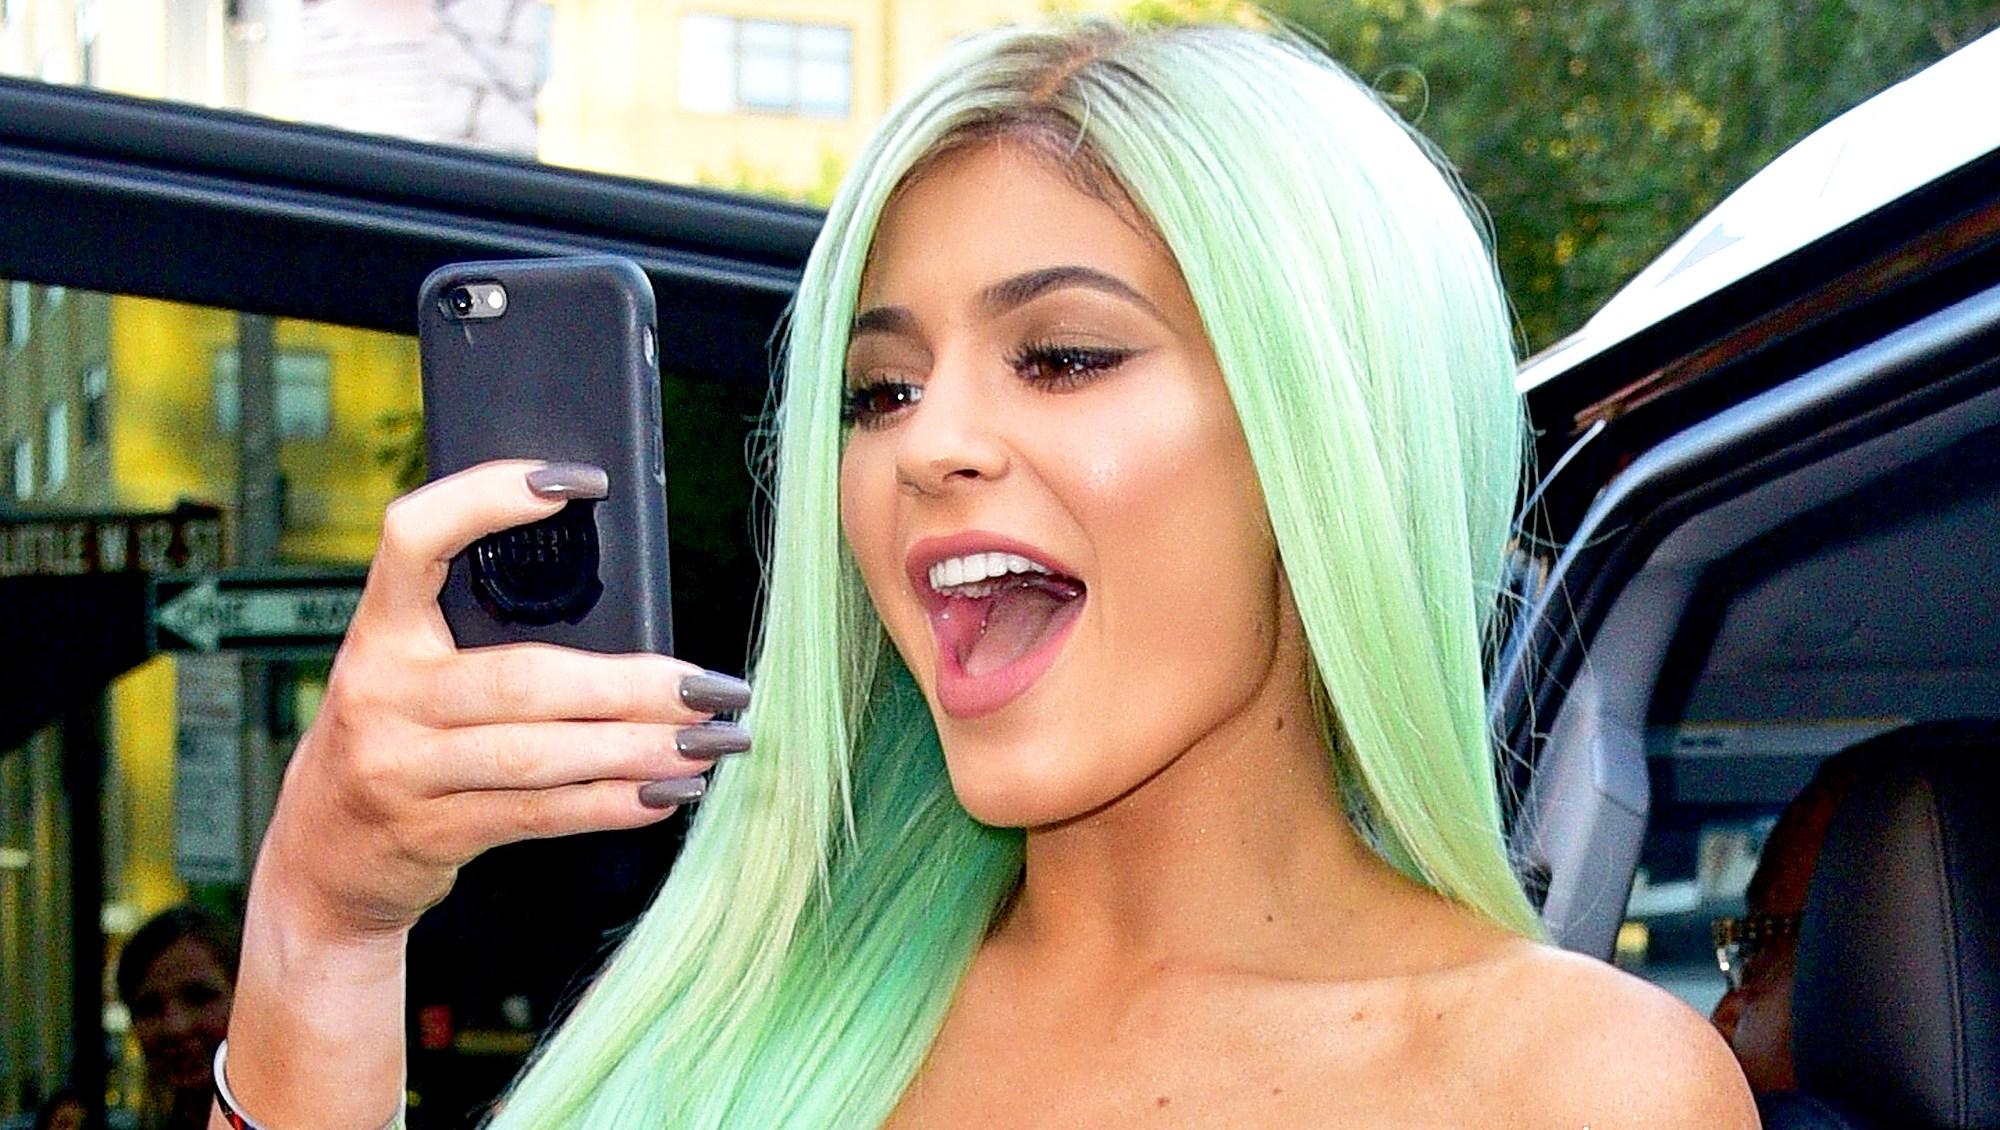 Kylie Jenner seen on the streets of Manhattan on September 16, 2015 in New York City.